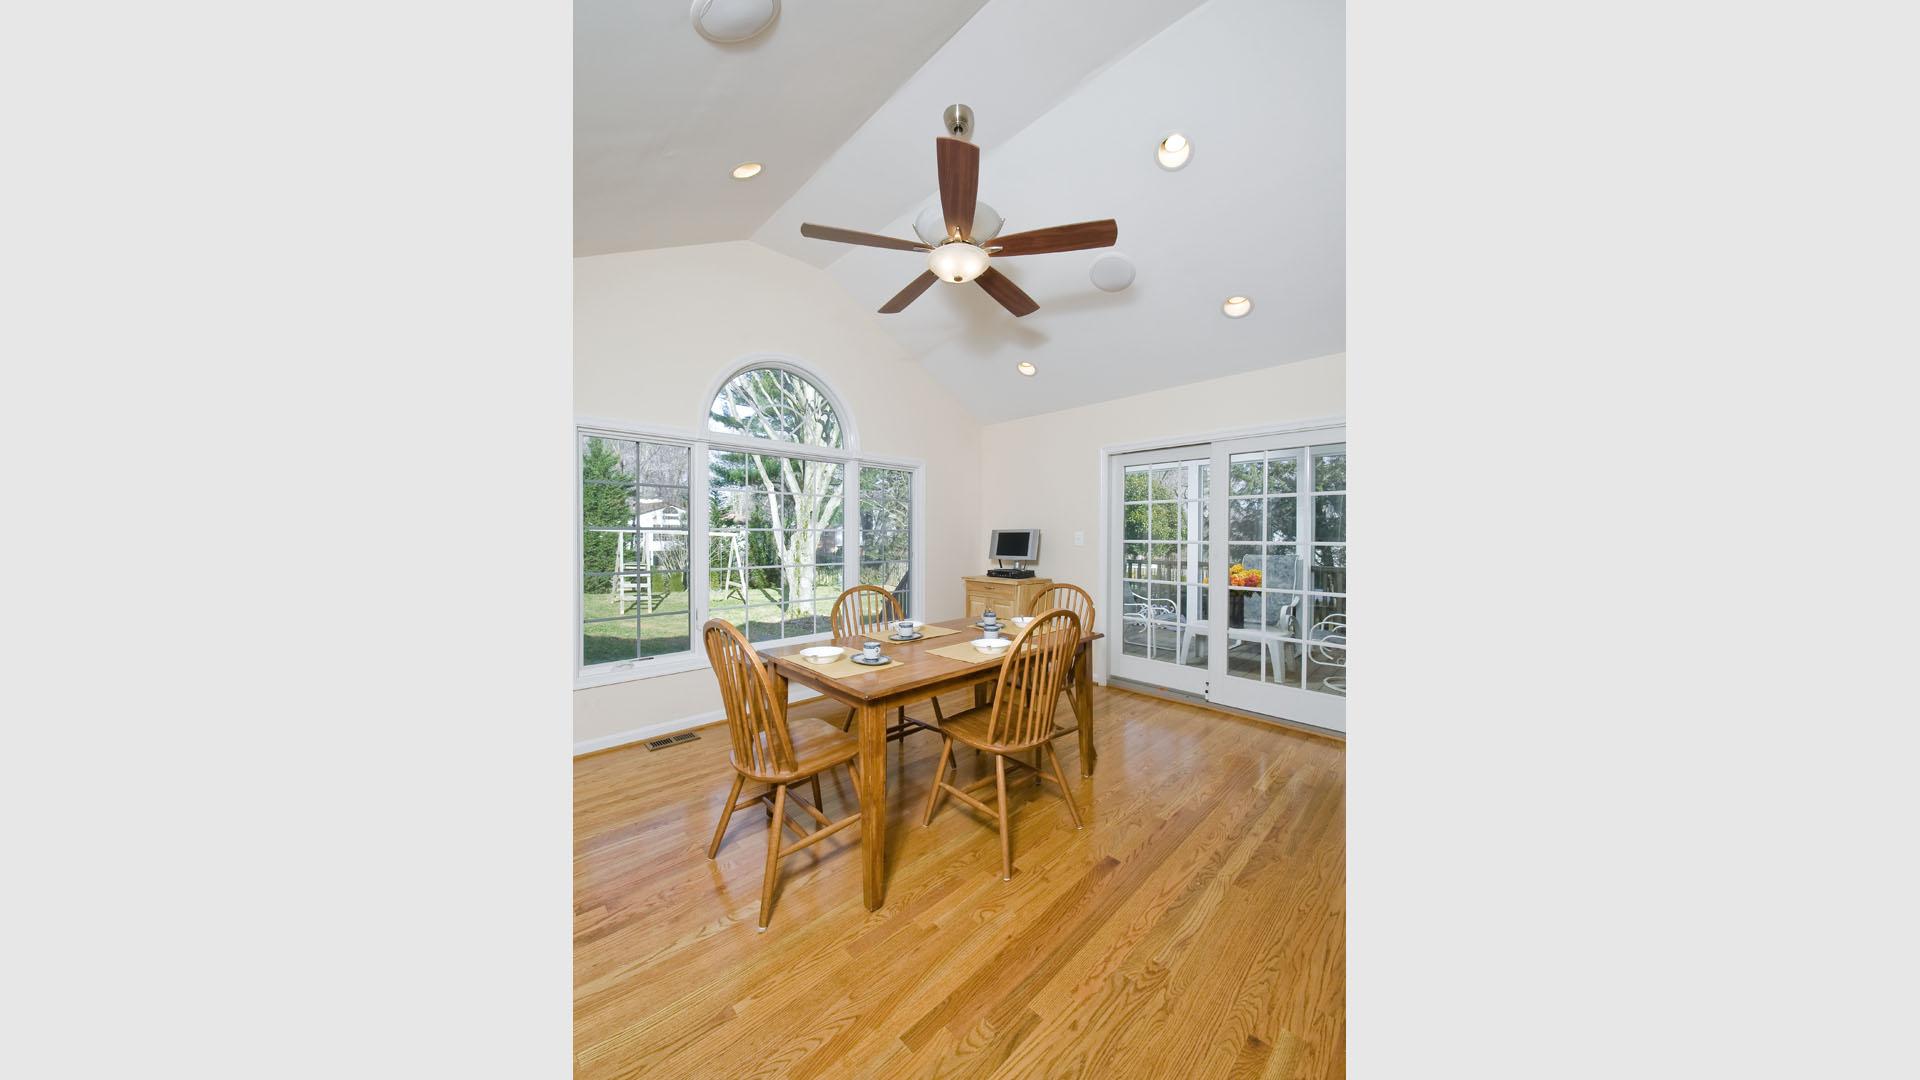 2011 National NARI CotY Southeast Regional Award Winner, Residential Addition Under $100,000